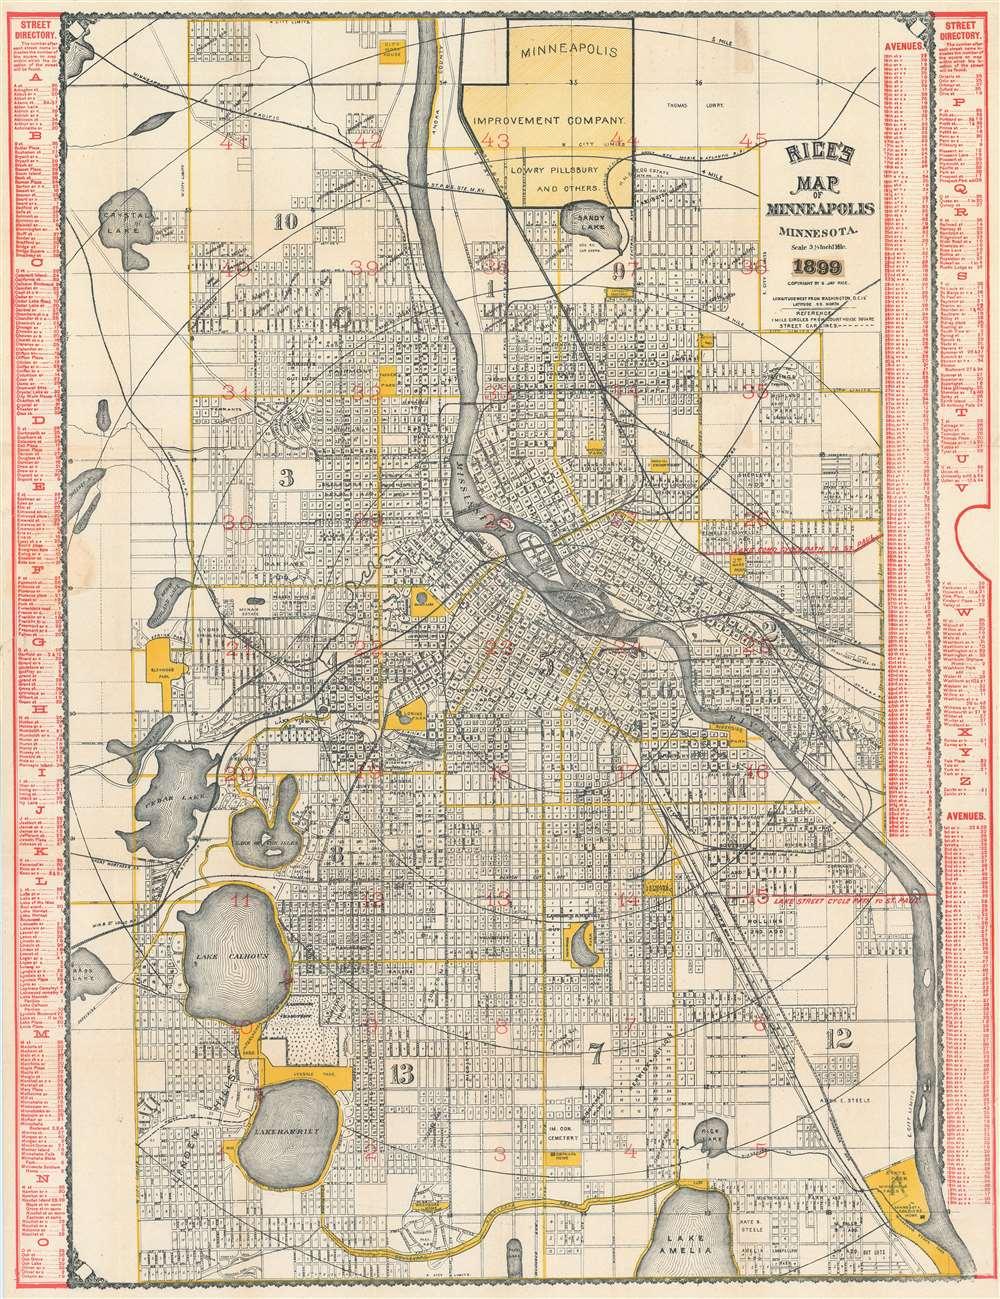 Rice\'s Map of Minneapolis Minnesota.: Geographicus Rare ...